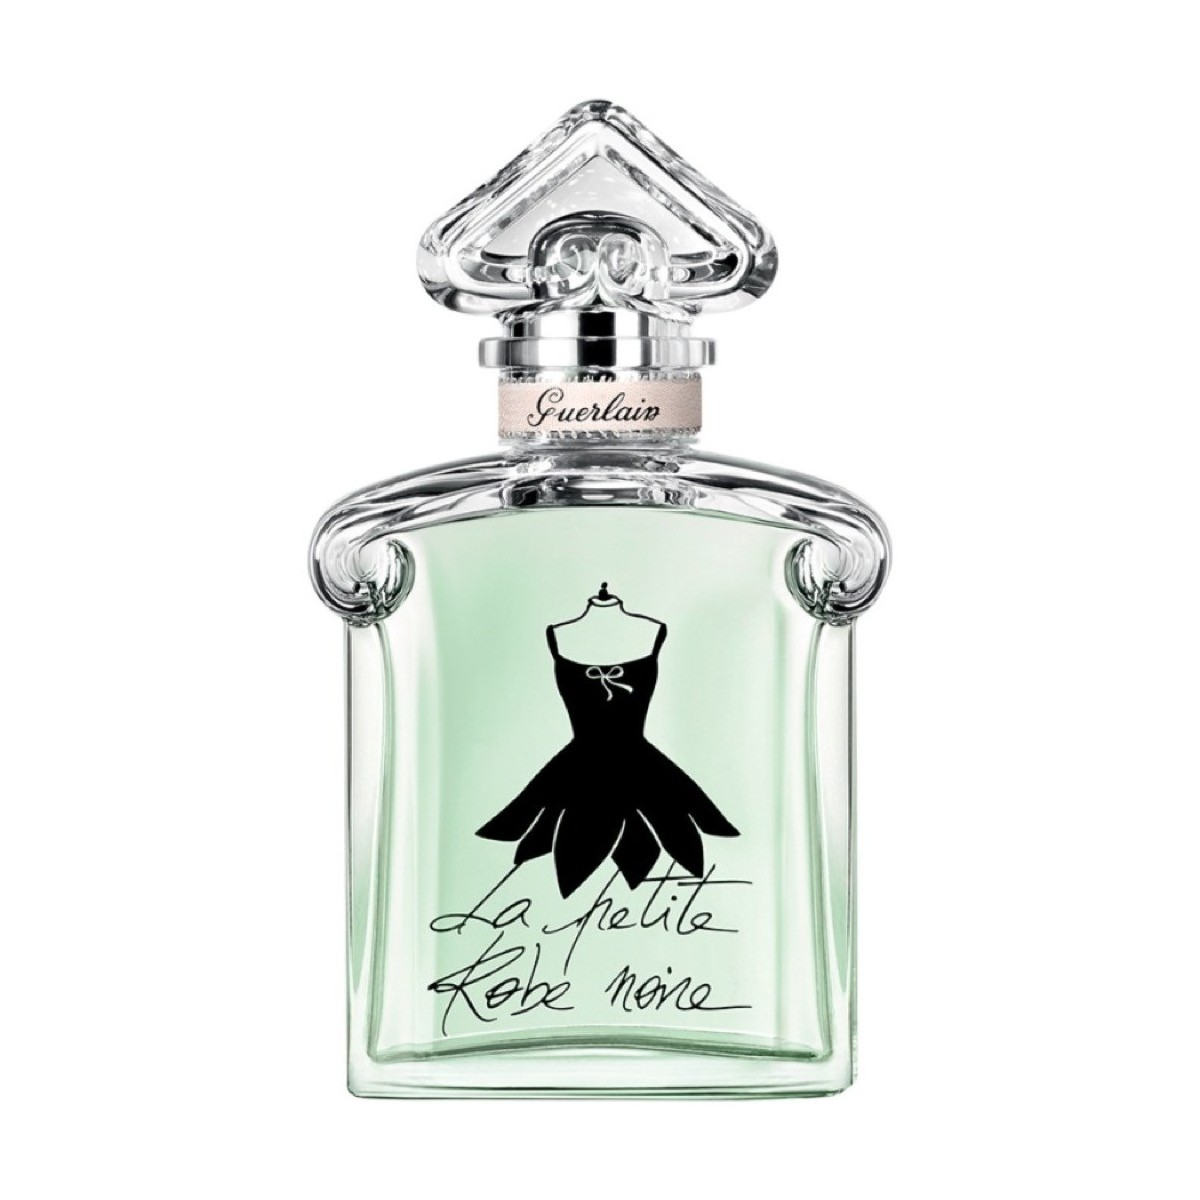 اد تویلت زنانه گرلن مدل La Petite Robe Noire Eau Fraiche حجم 75 میلی لیتر